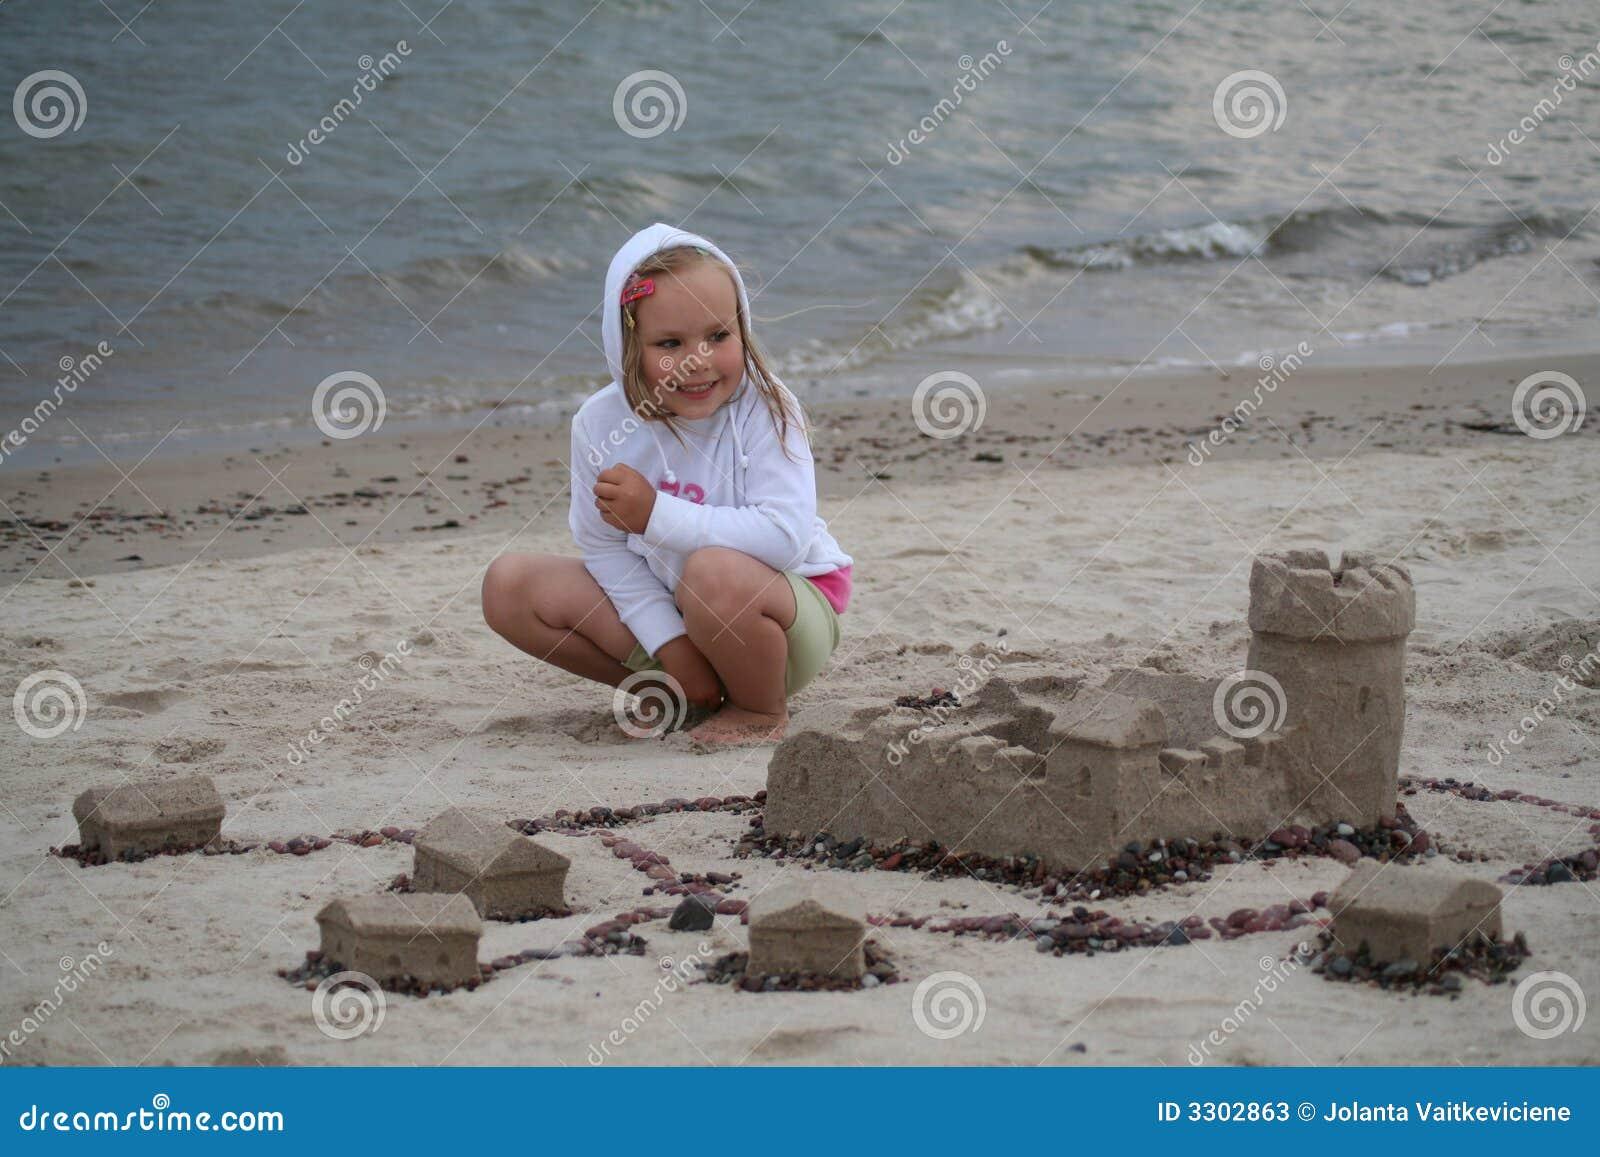 Sand castle builder